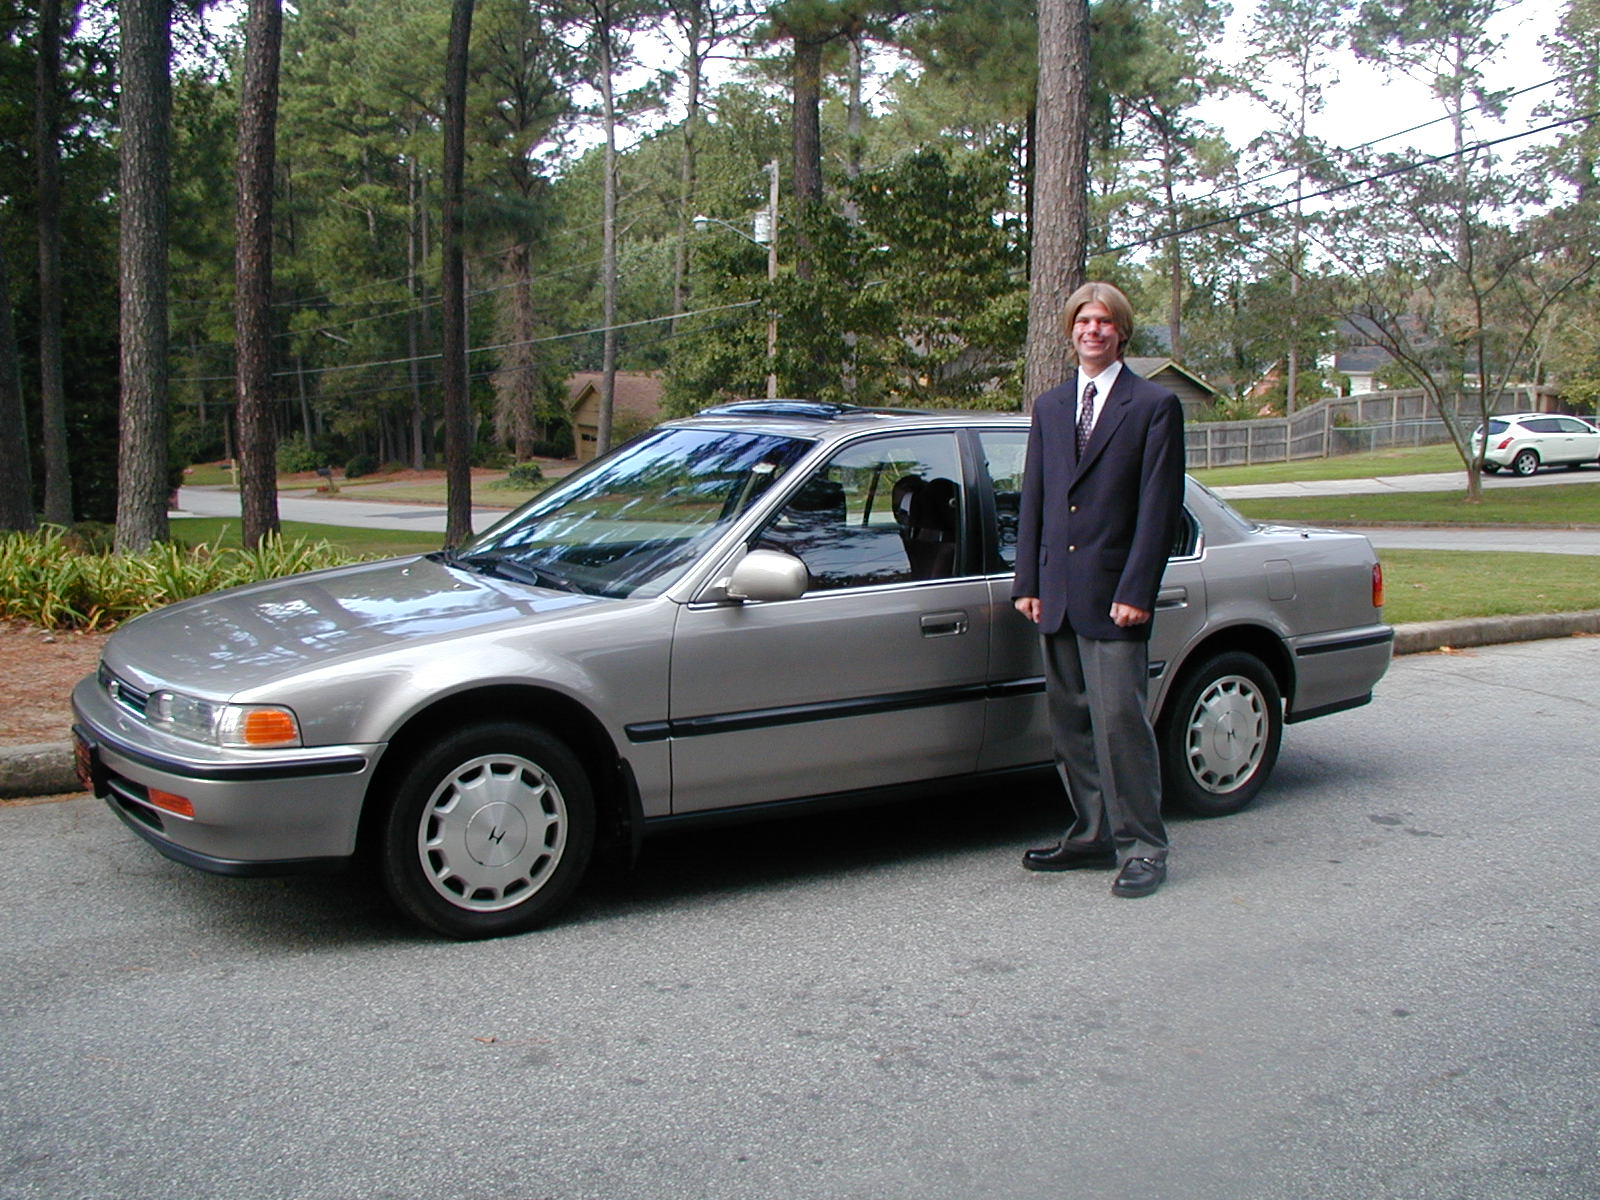 1998 Honda Accord Reviews >> 1993 Honda Accord - Pictures - CarGurus